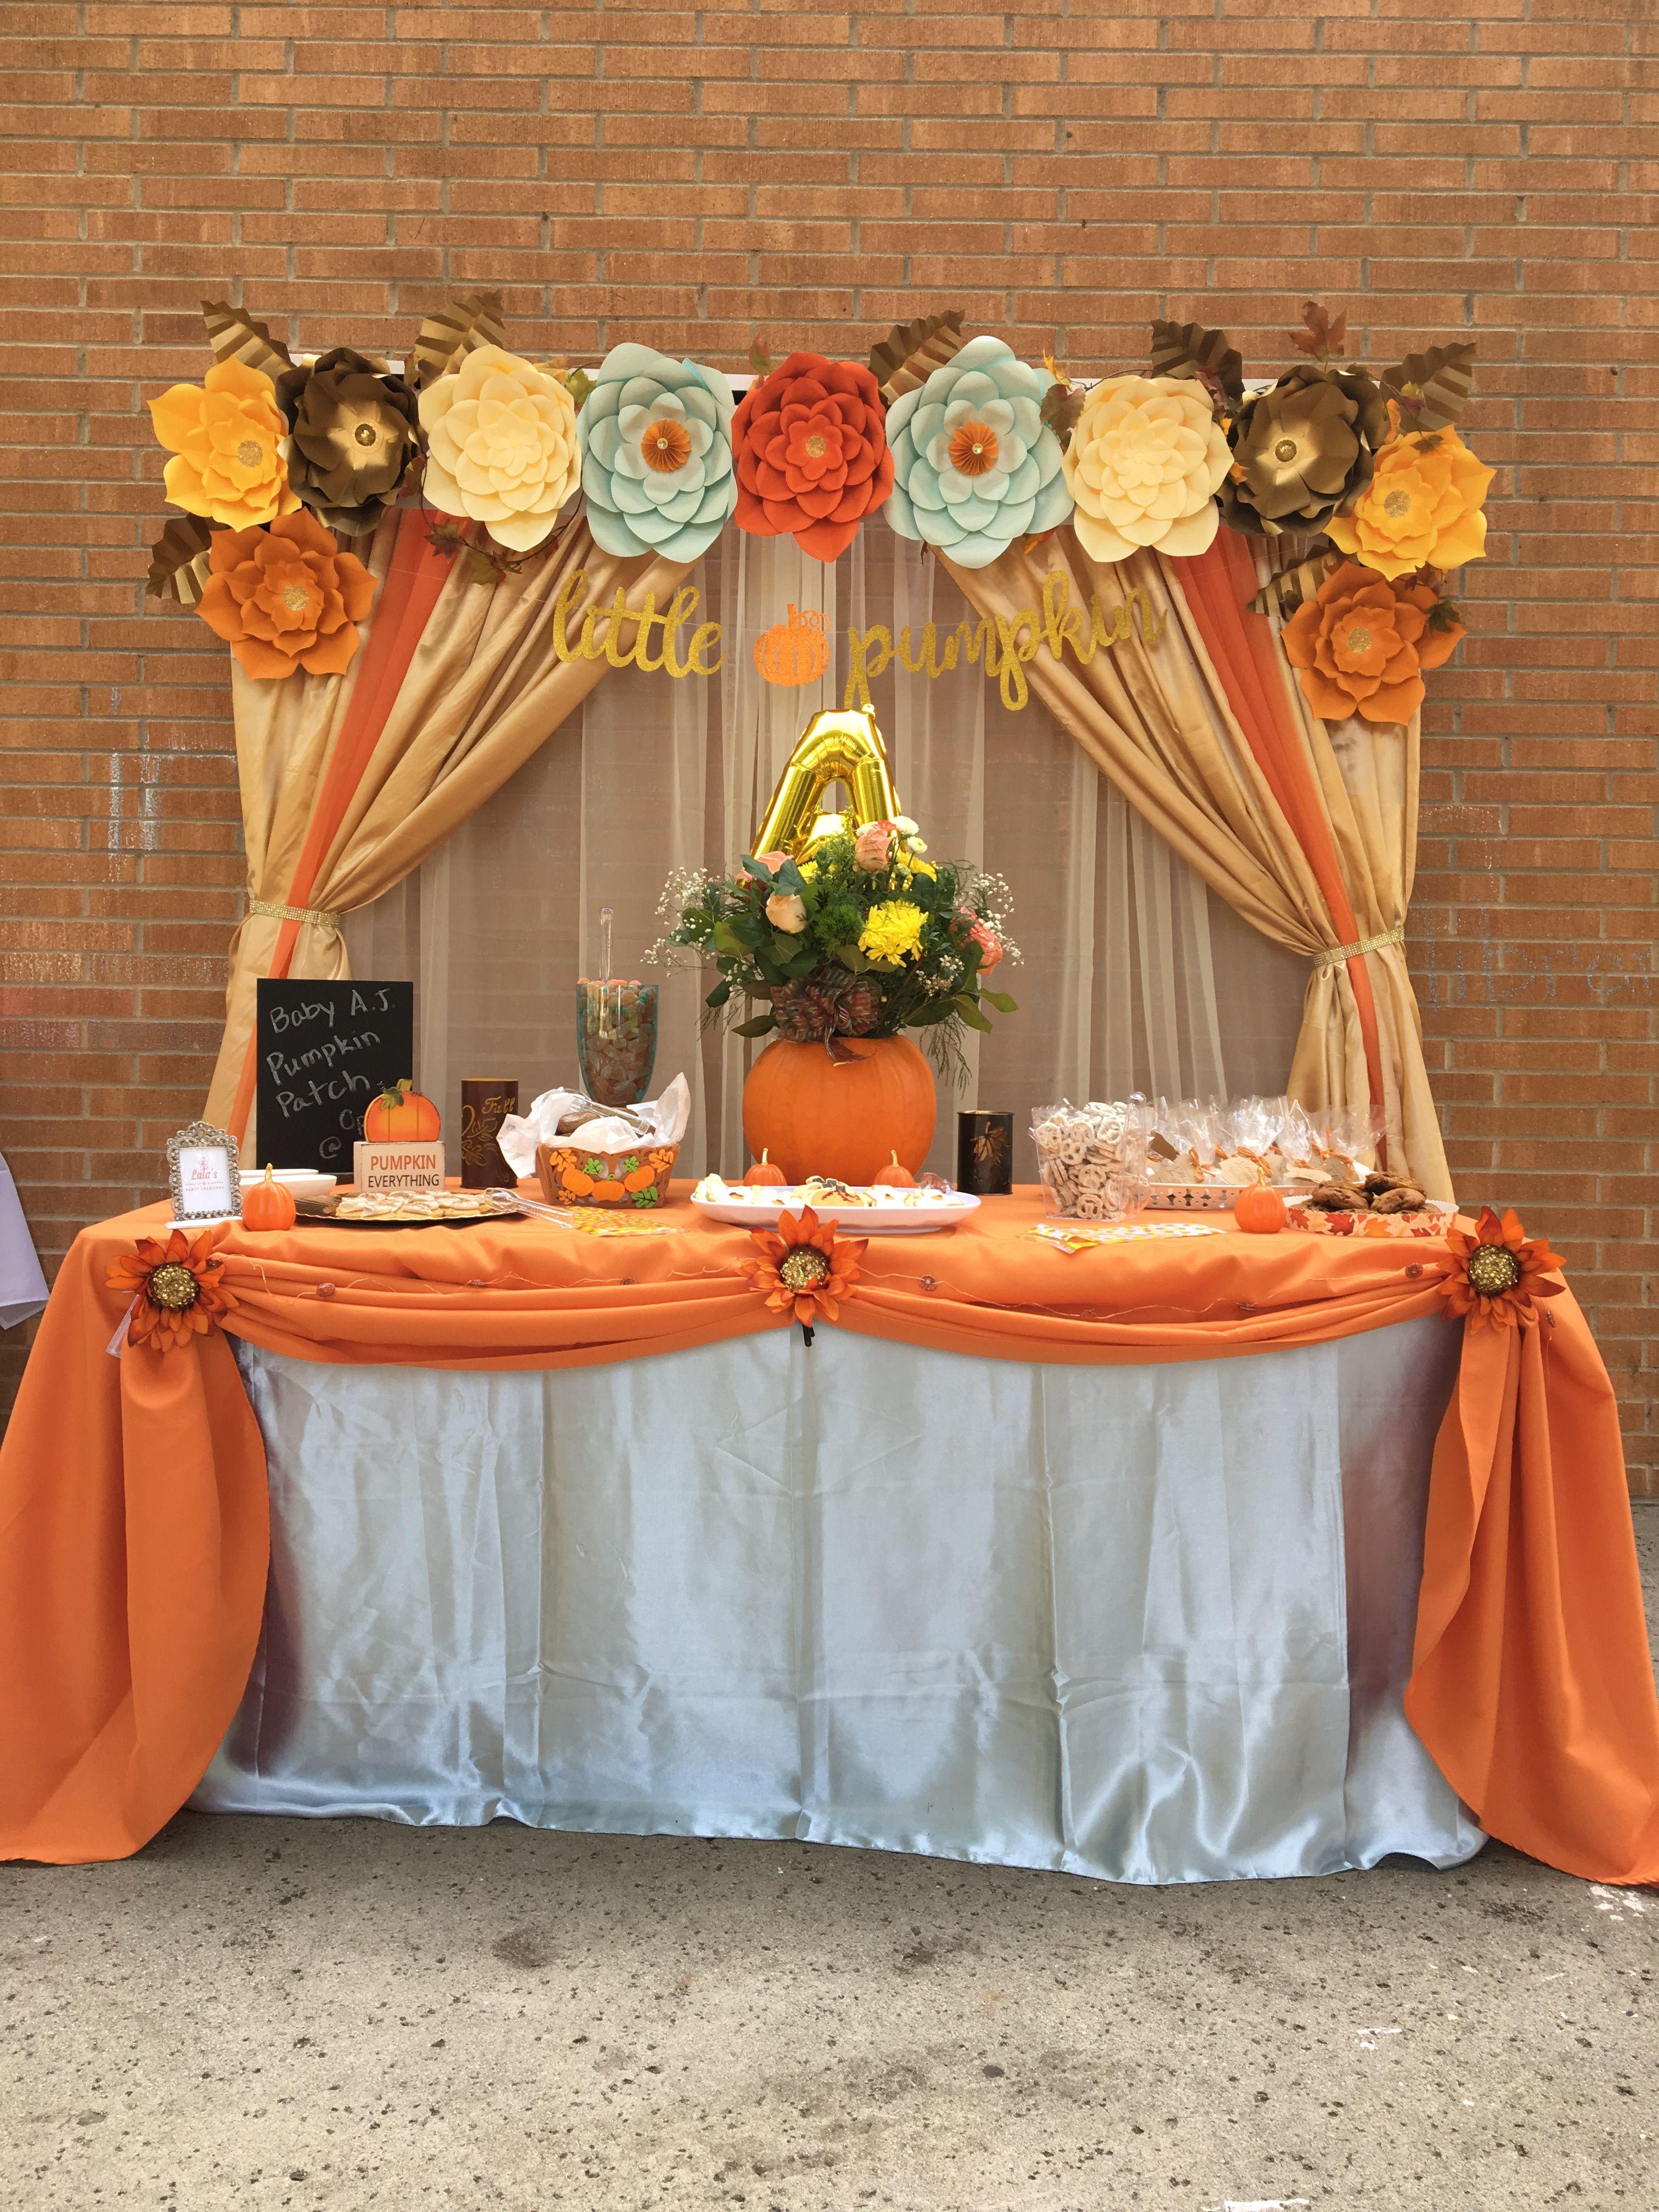 Little Pumpkin Theme Babyshower Backdrop For Dessert Table Lalaspartycreations5 Ig Baby Shower Pumpkin Baby Shower Dessert Table Pumpkin Theme Baby Shower